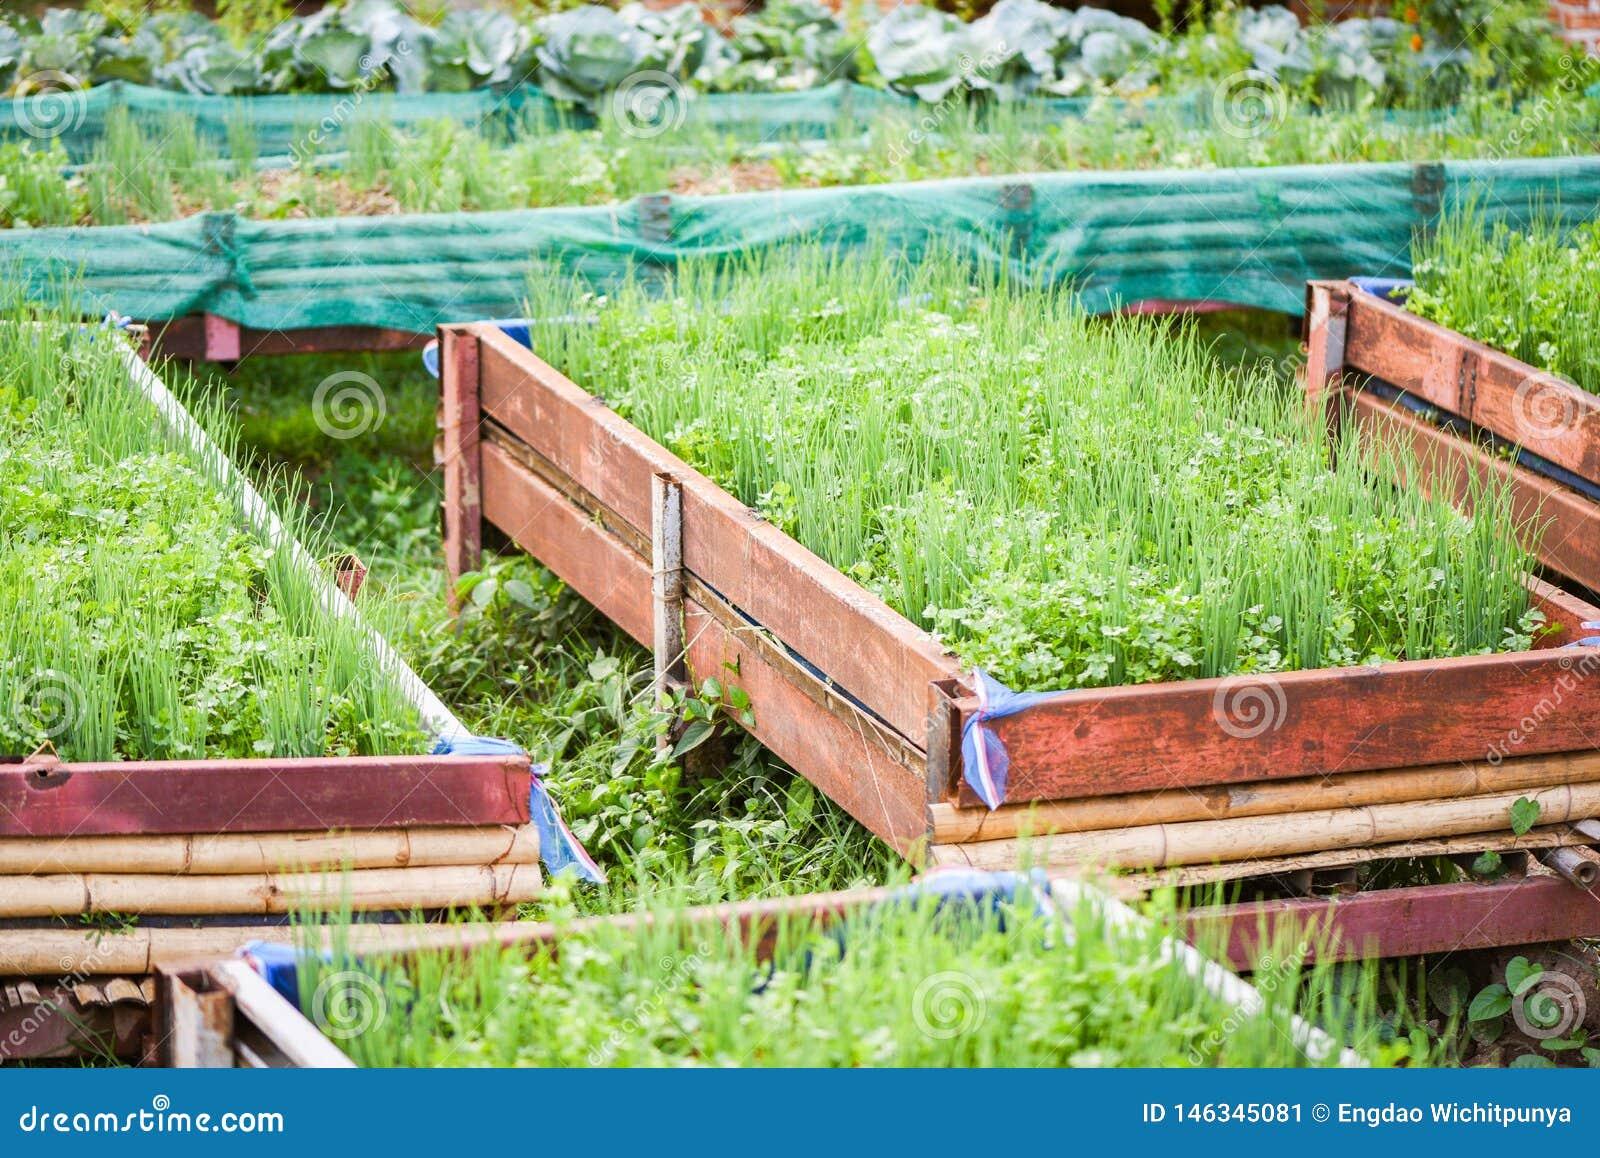 Oignon Blanc A Planter plantation de l'oignon de ressort de coriandre et d'oignon